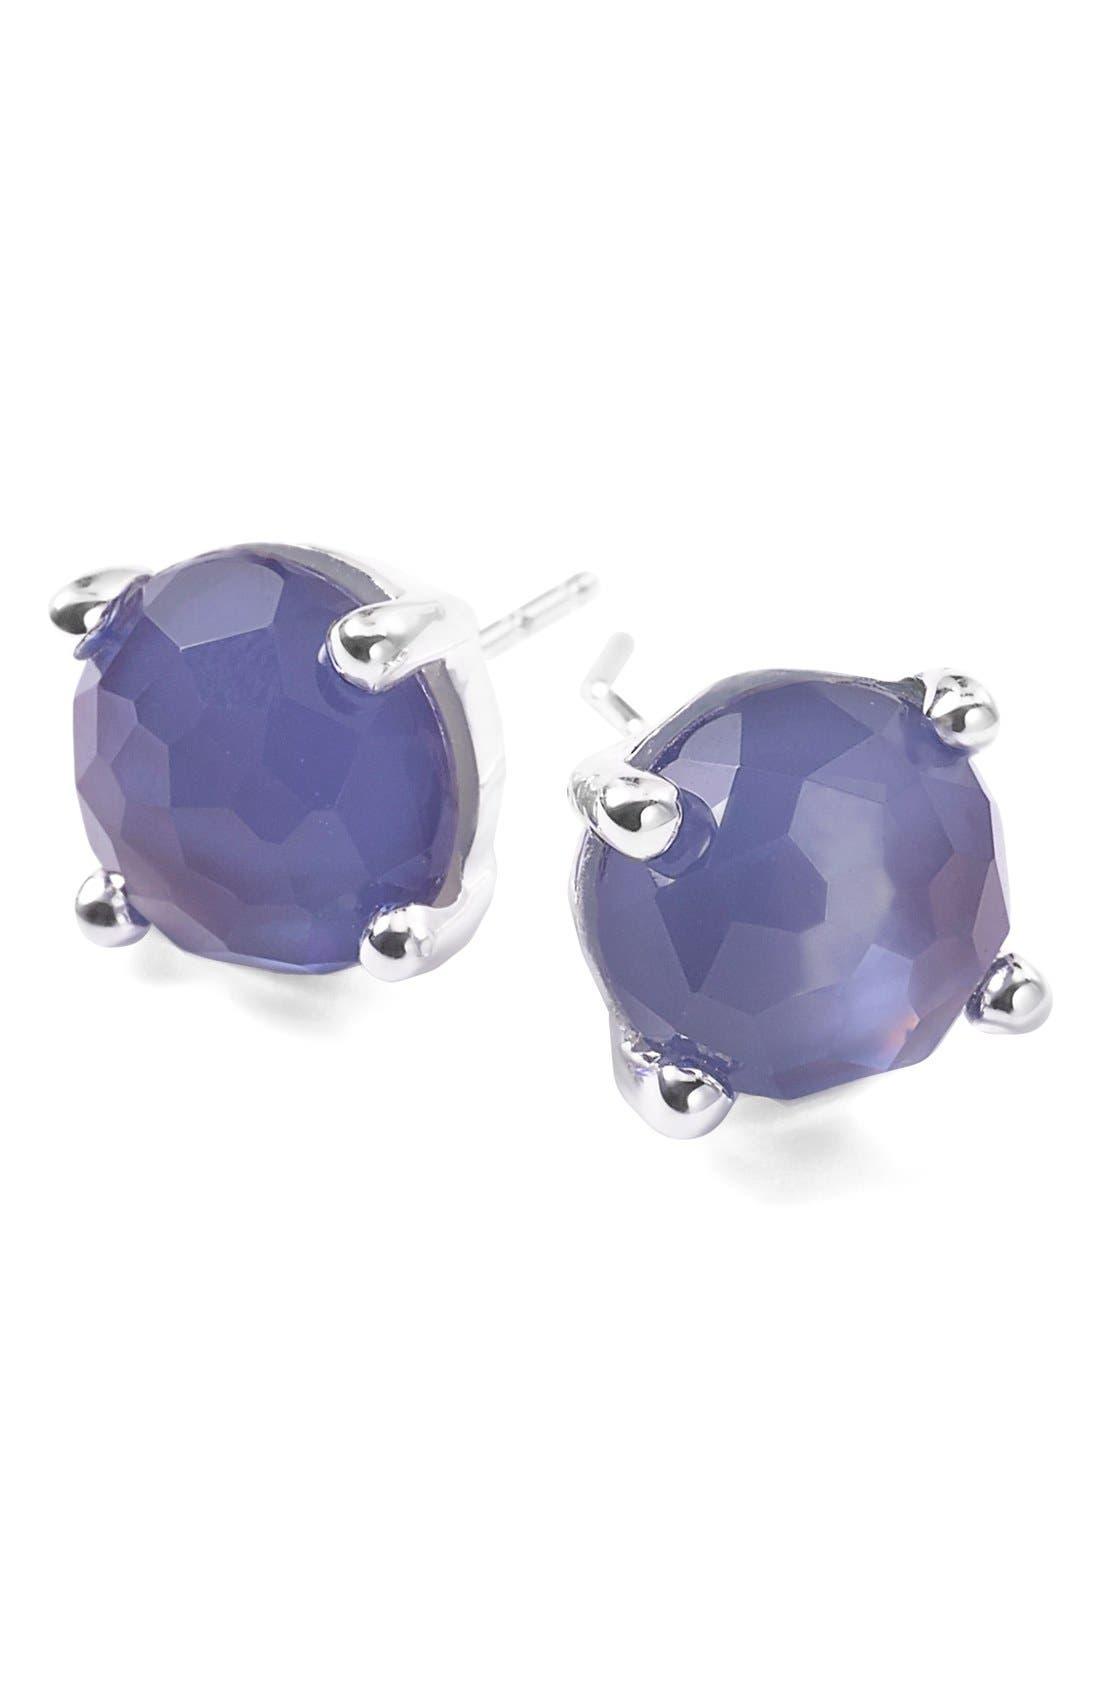 Main Image - Ippolita 'Rock Candy' Mini Stud Earrings